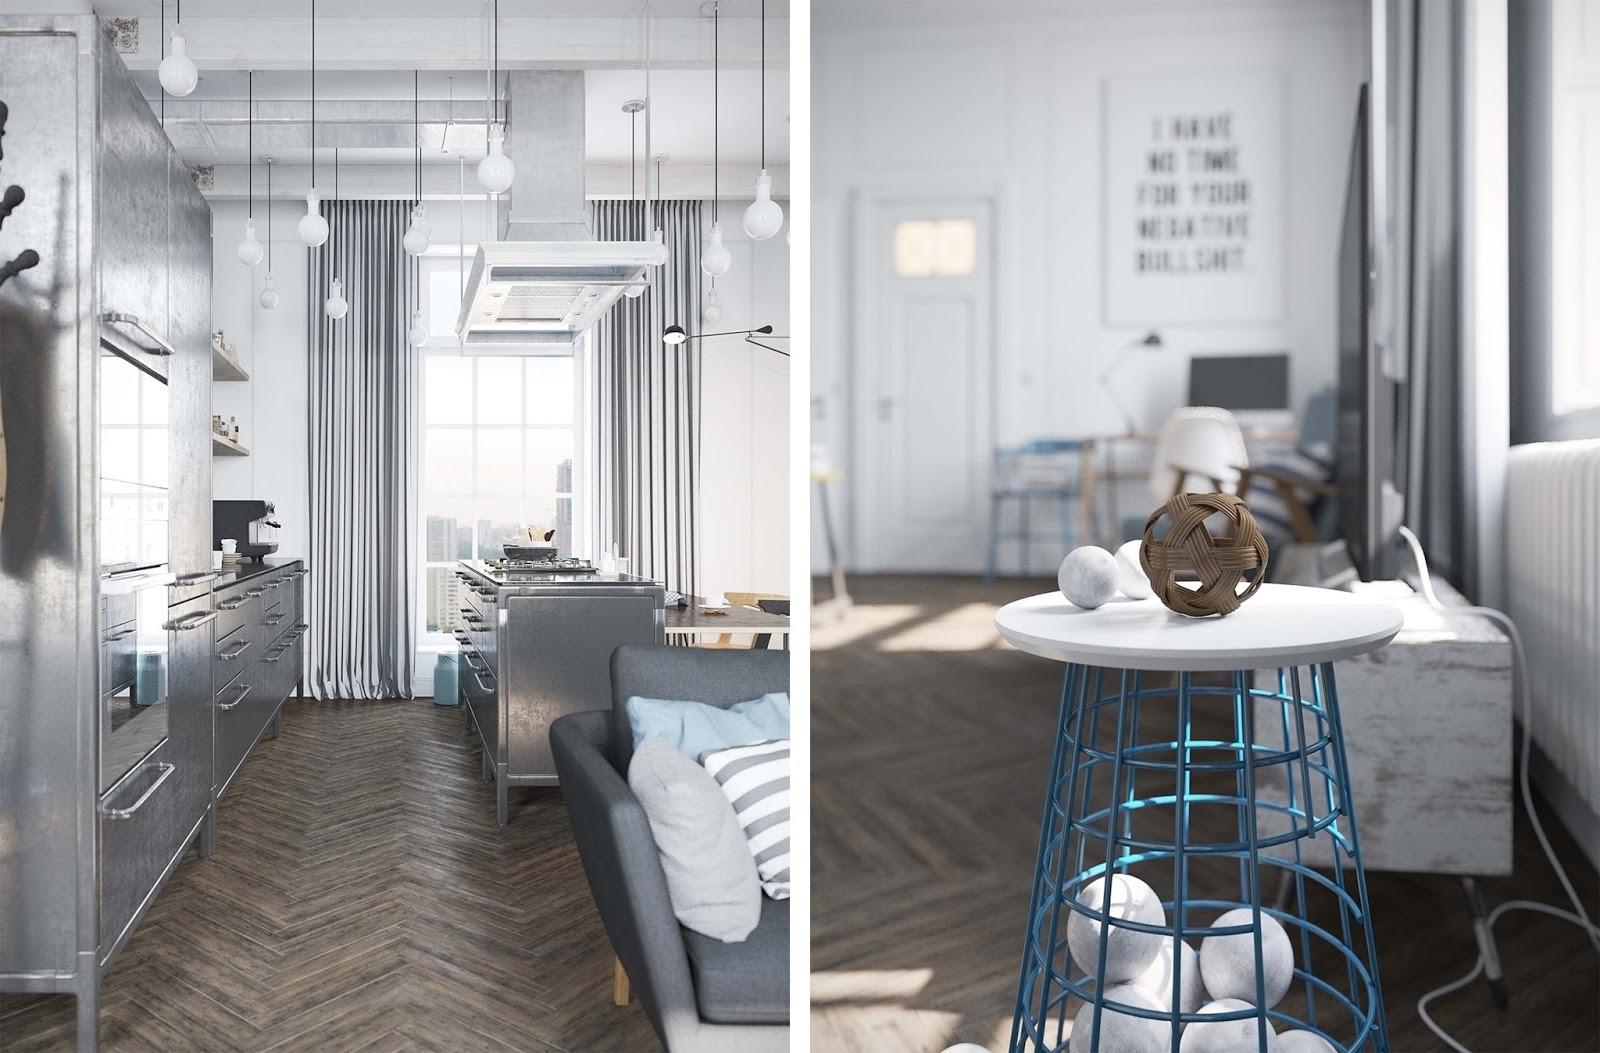 Appartamento scandinavo industriale e poetico by denis for Appartamento design industriale